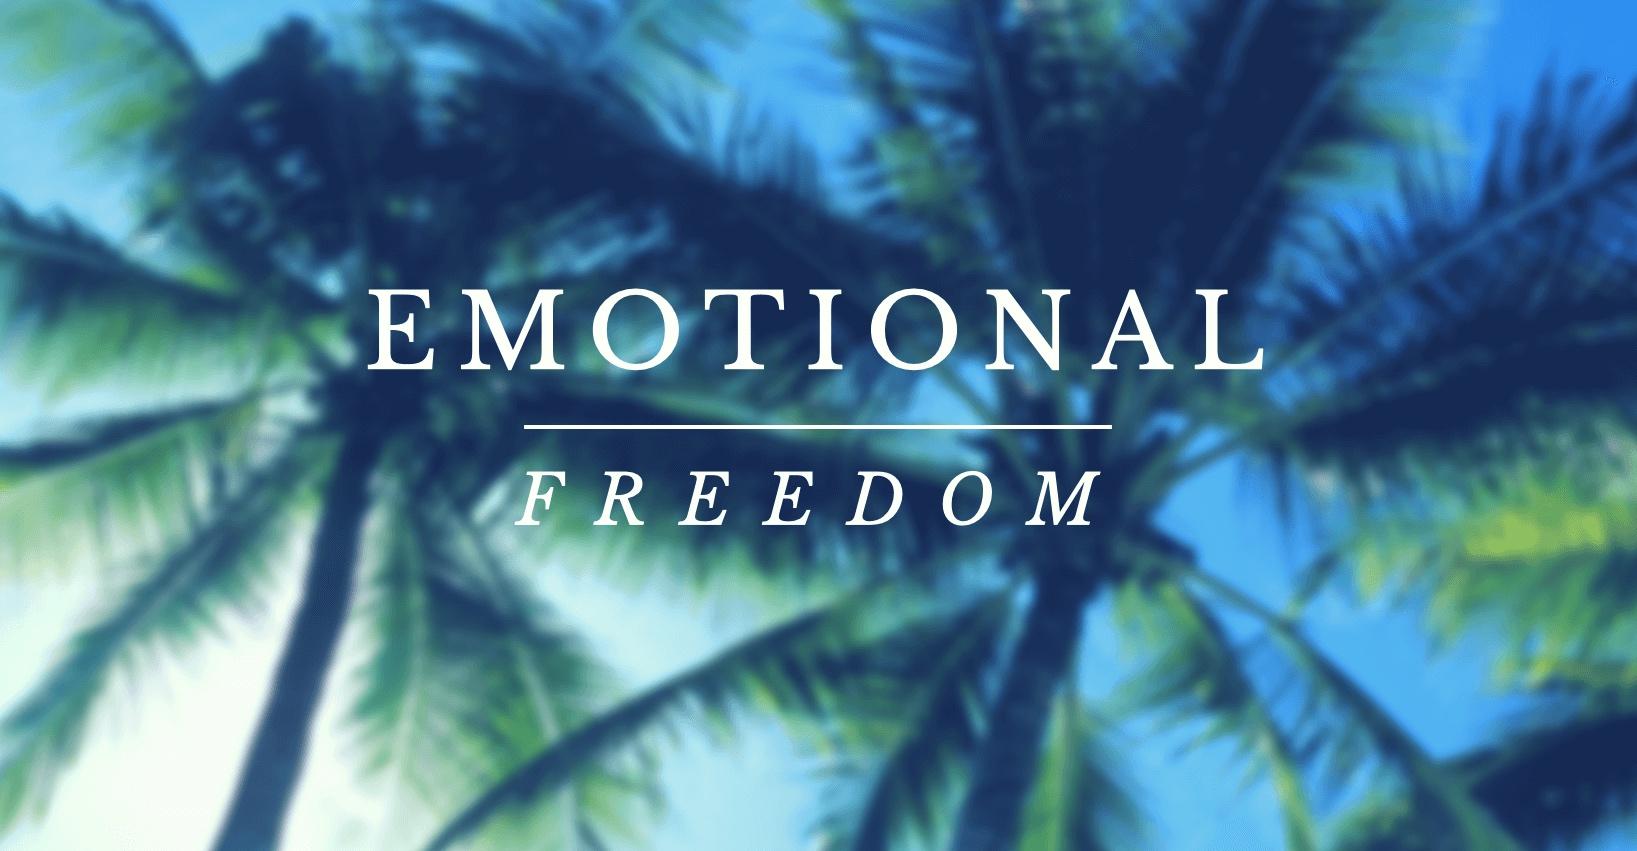 Emotional+freedom+pic+tiny.jpg